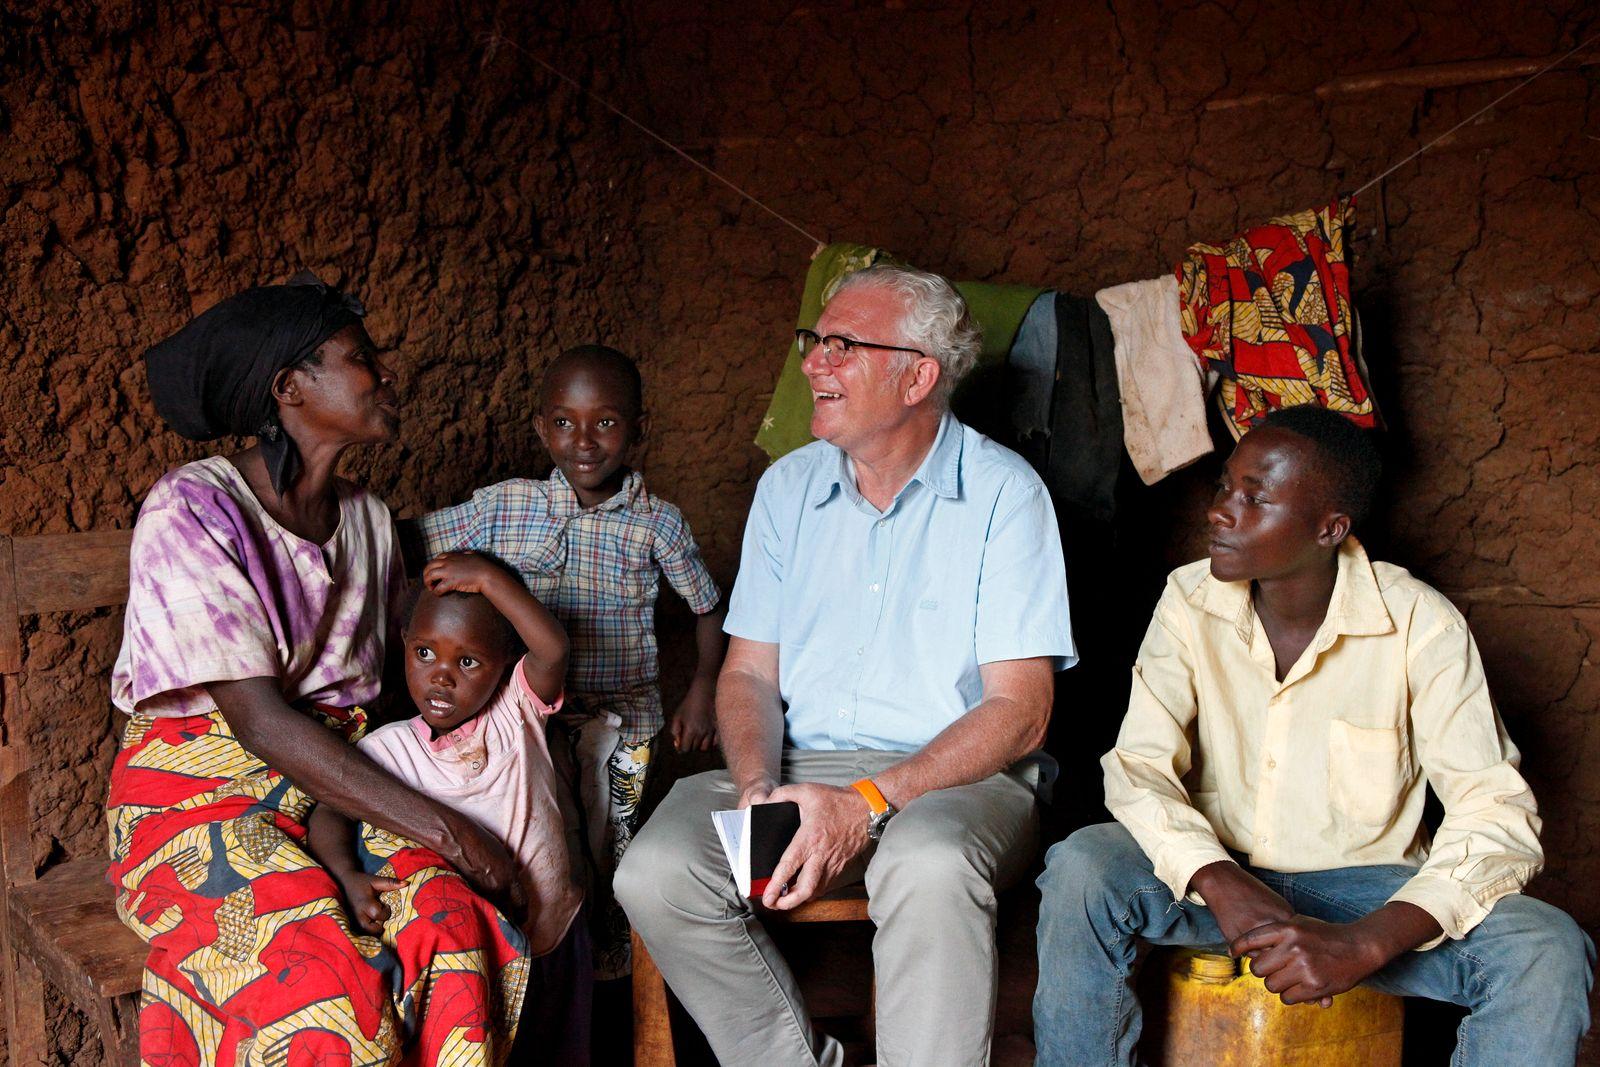 Ruanda 20 Jahre nach dem Genozid